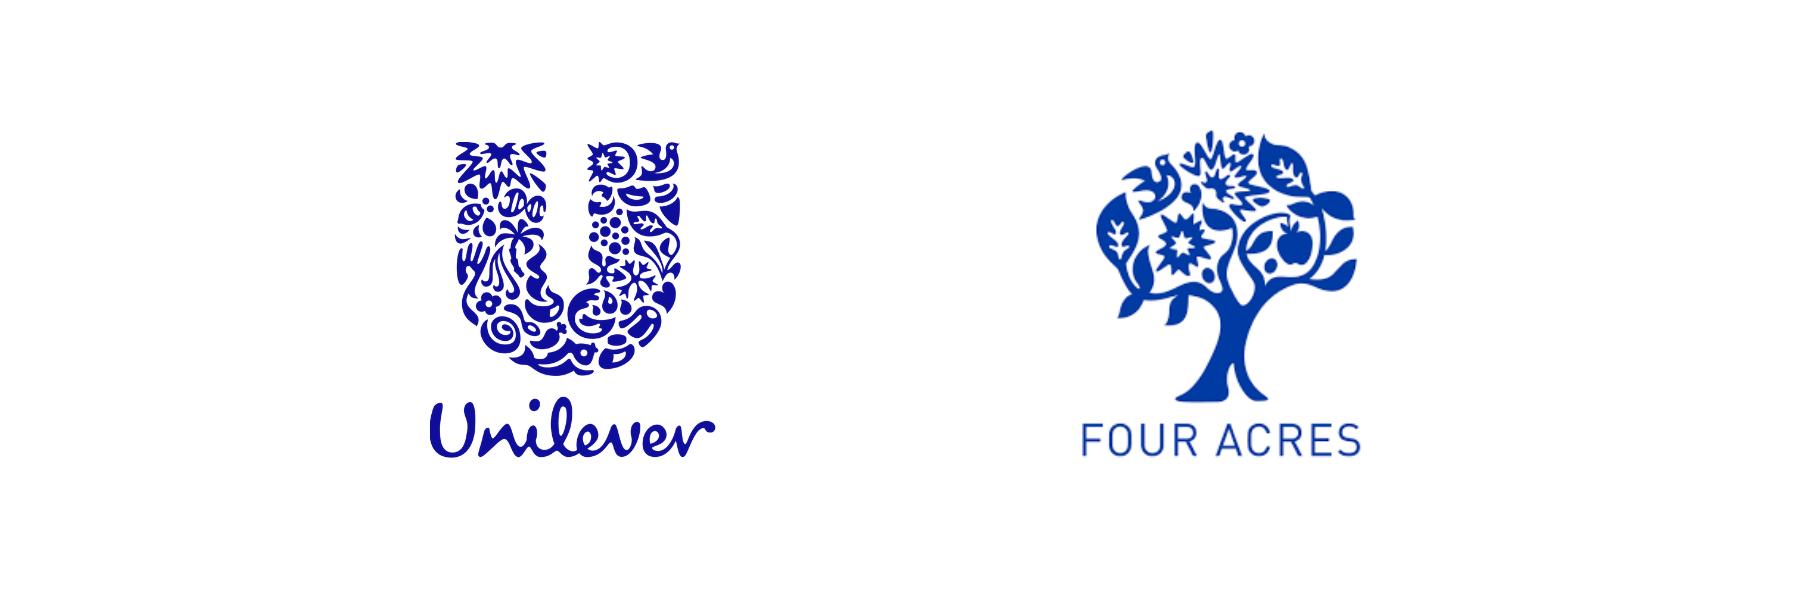 circle comp logo (4).png